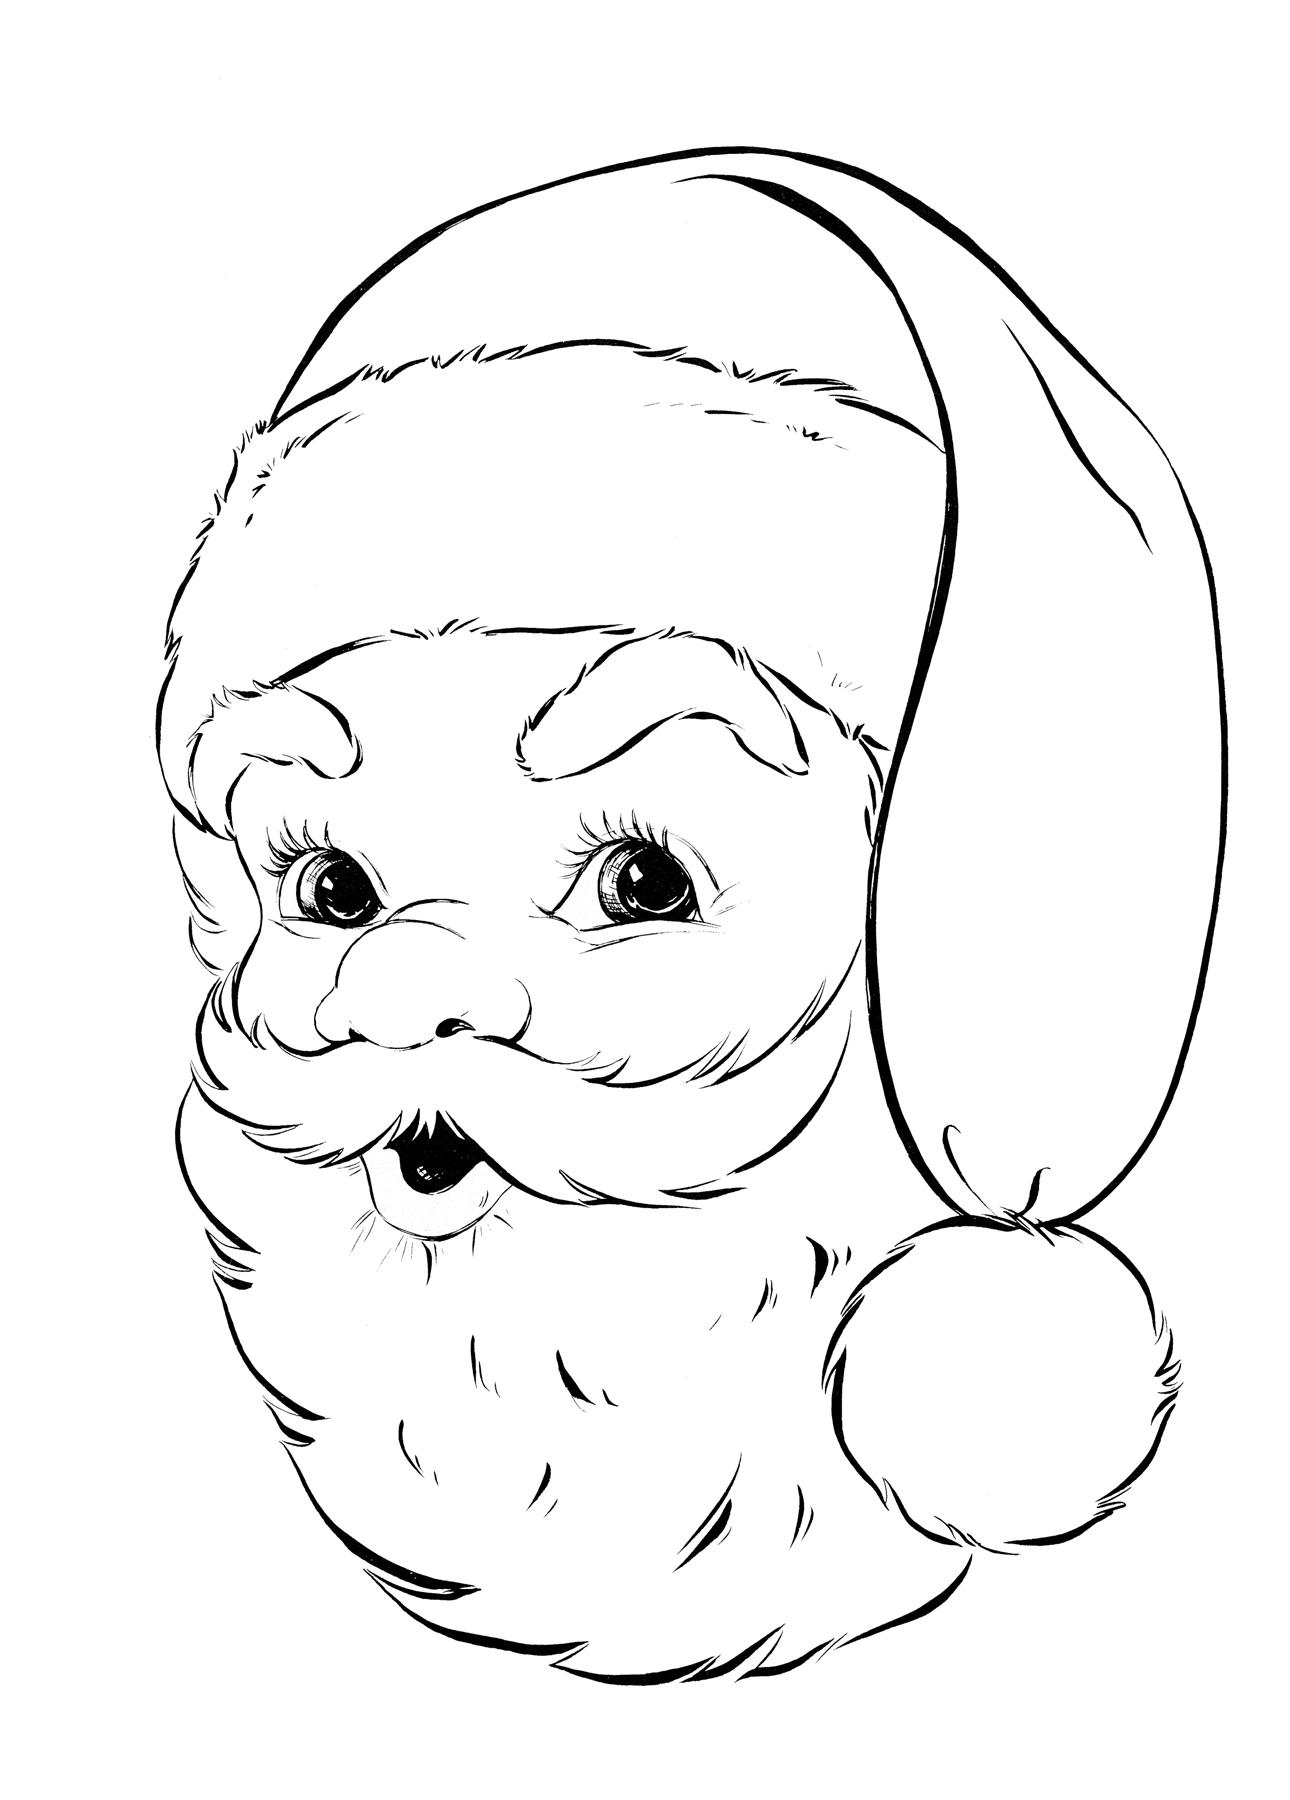 Retro Santa Coloring Page The Graphics Fairy